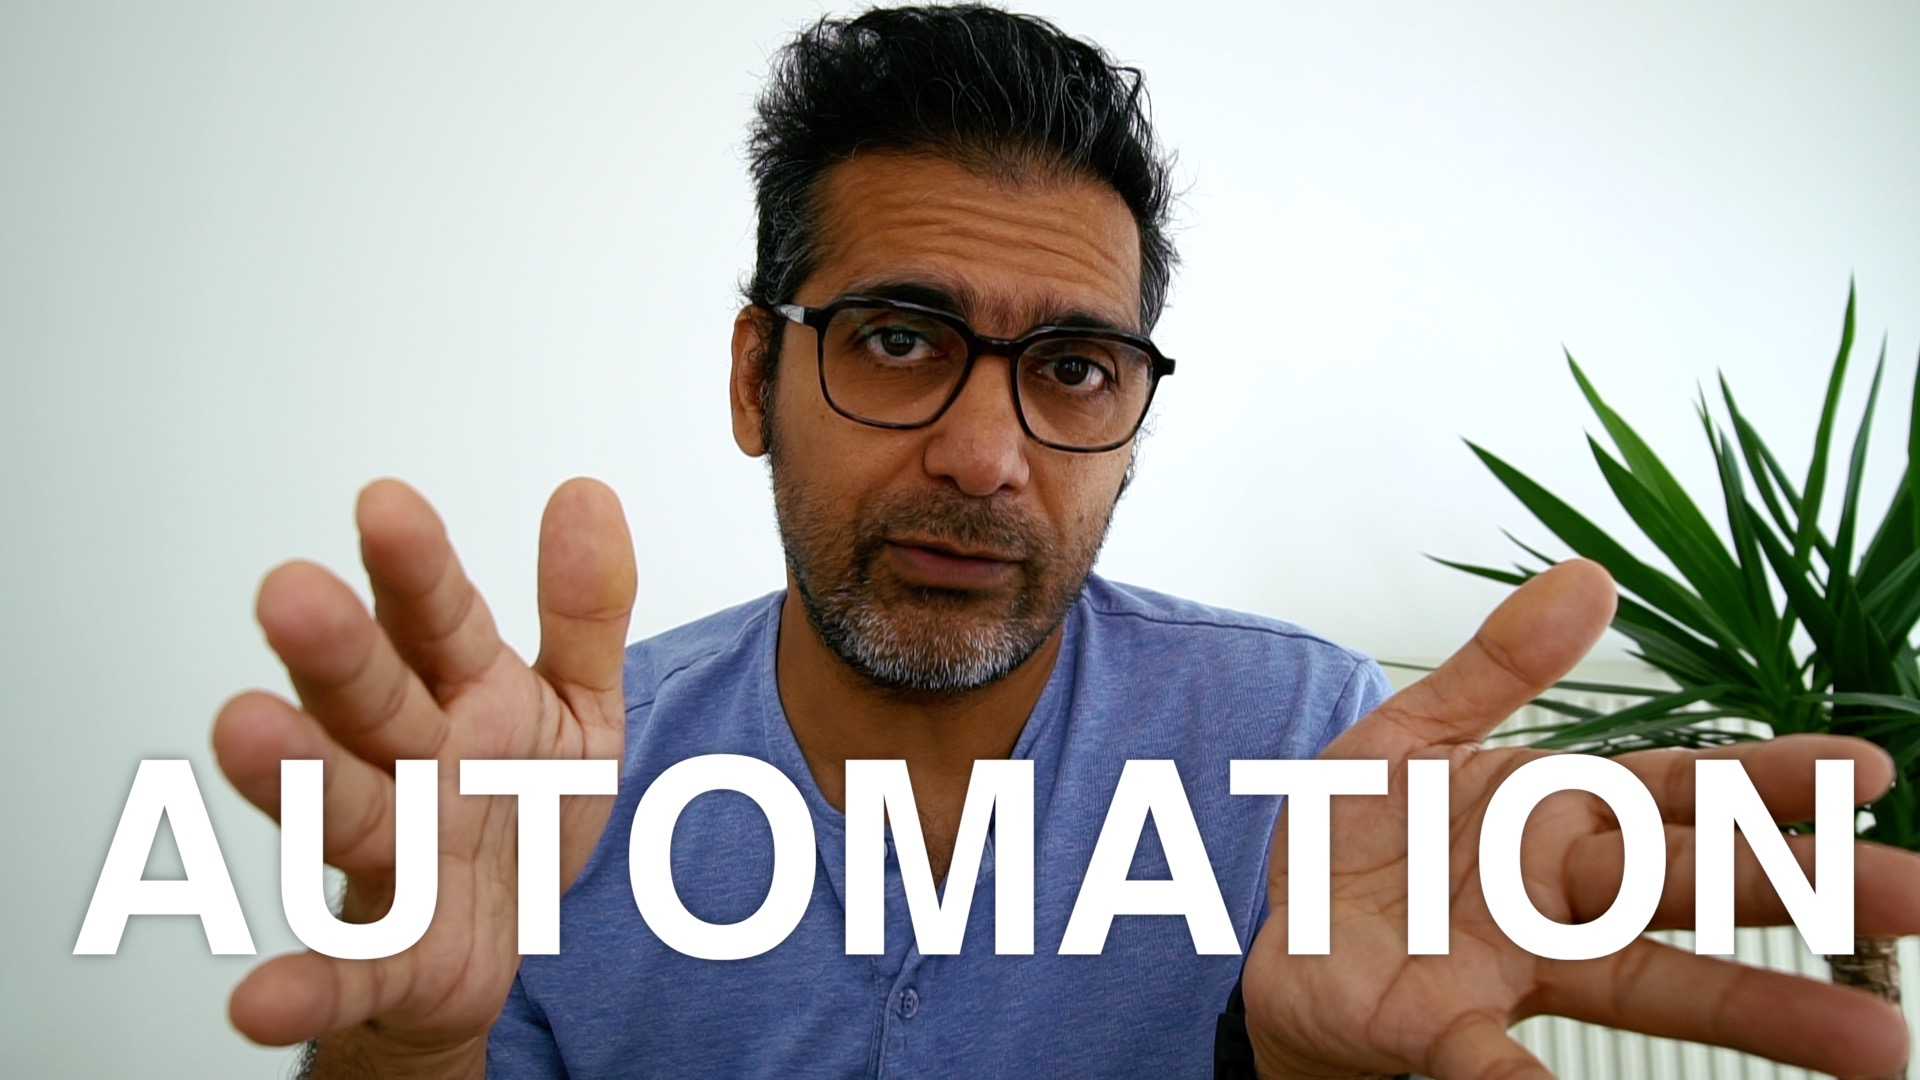 Zapier: Make mundane tasks easier with automation